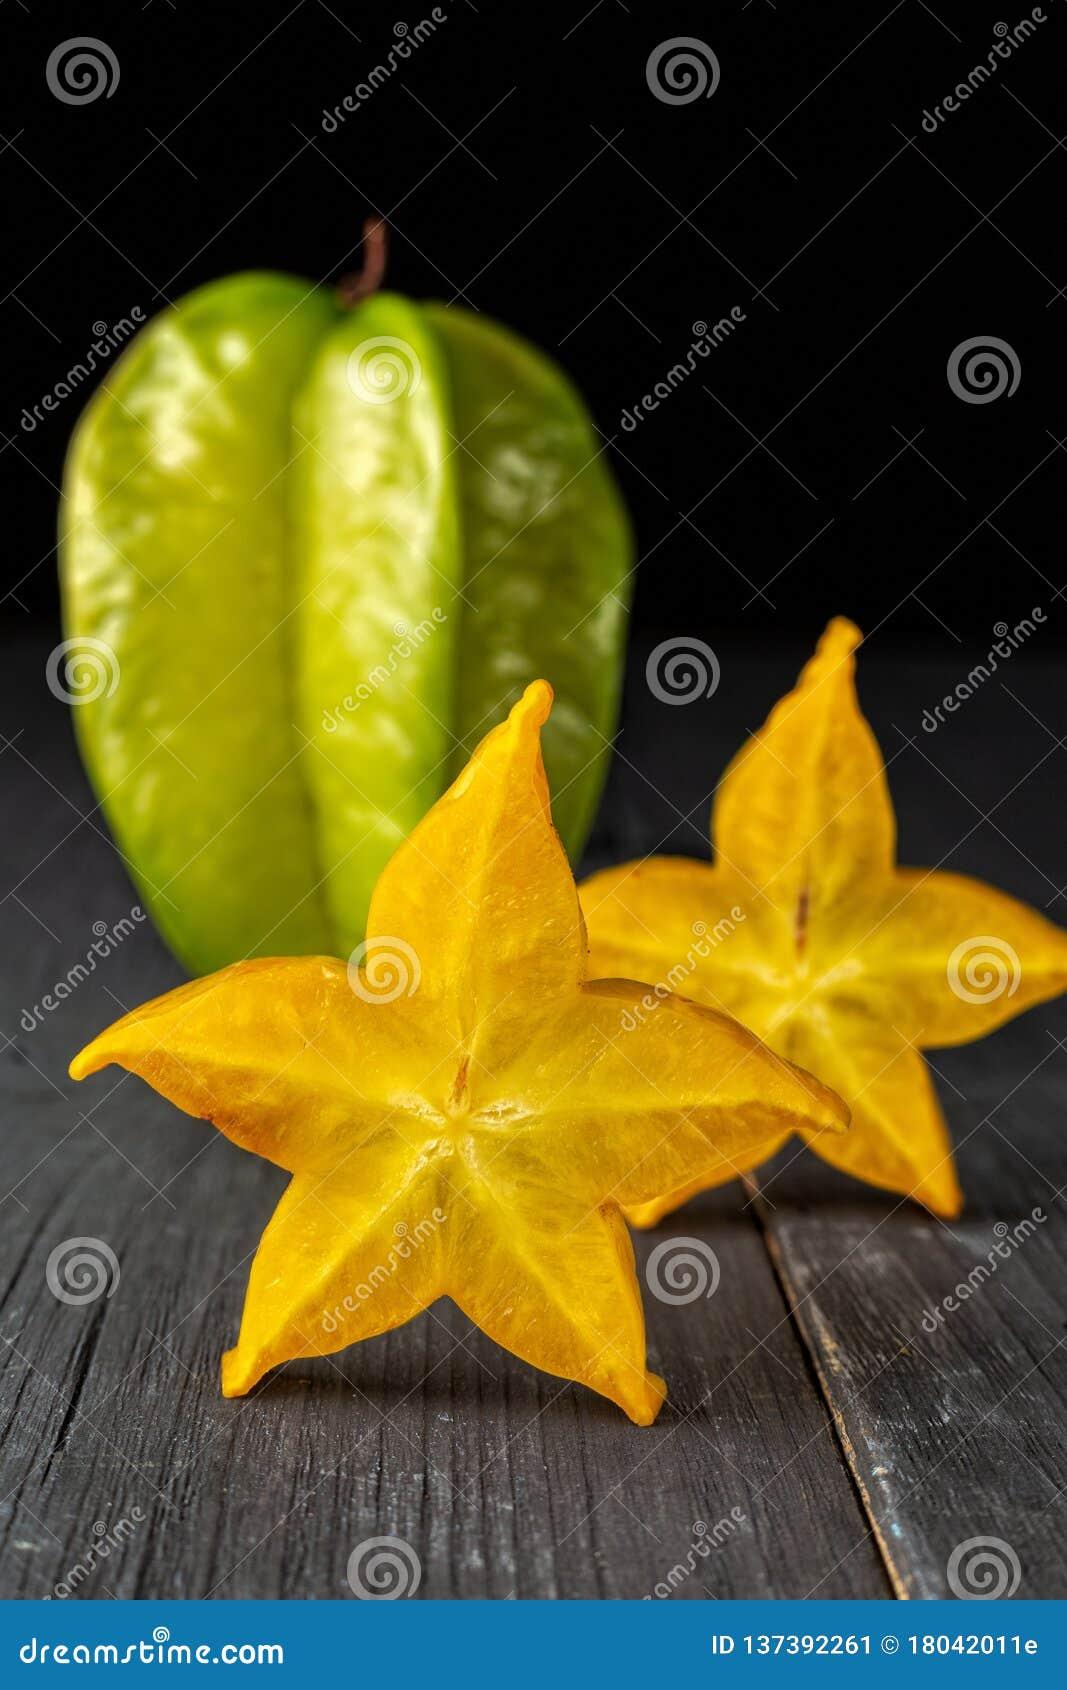 A Fruta Carambola Serve Para Que slices of ripe star fruit carambola or star apple starfruit